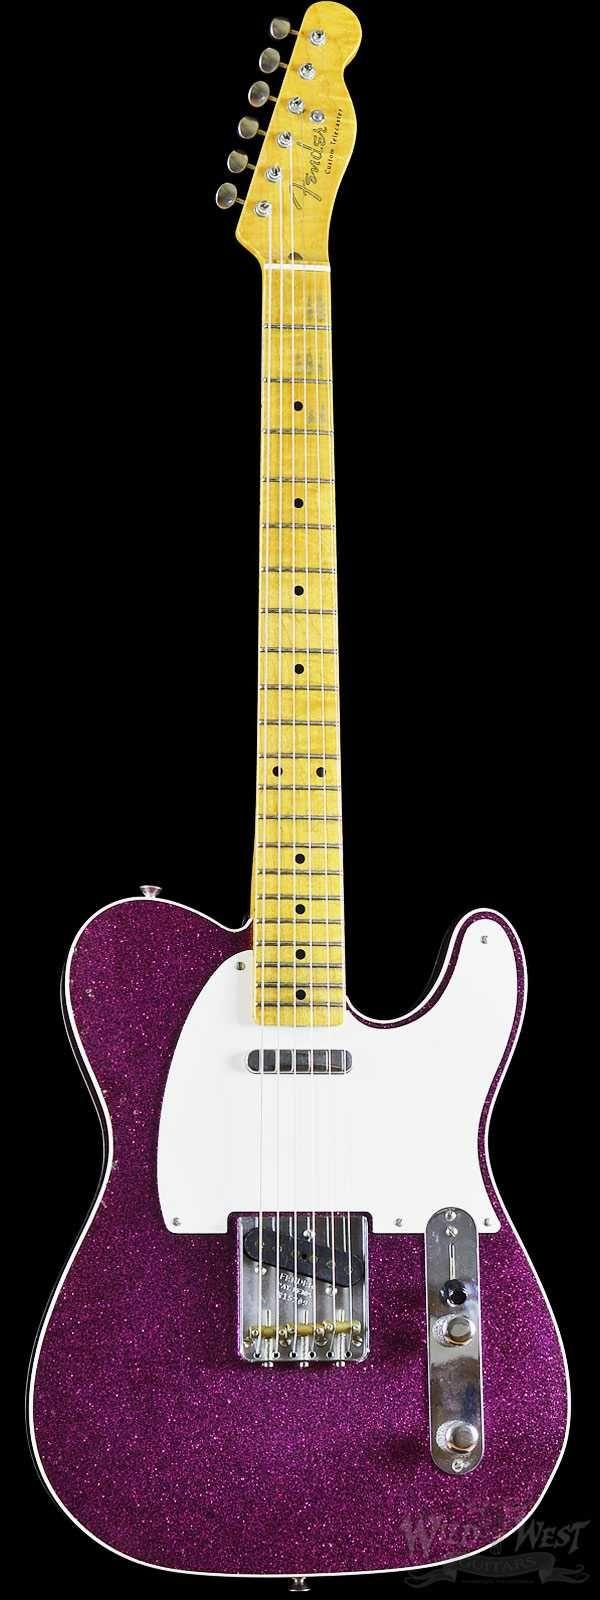 Fender 2016 Limited Edition 50's Telecaster Custom Journeyman Magenta Sparkle